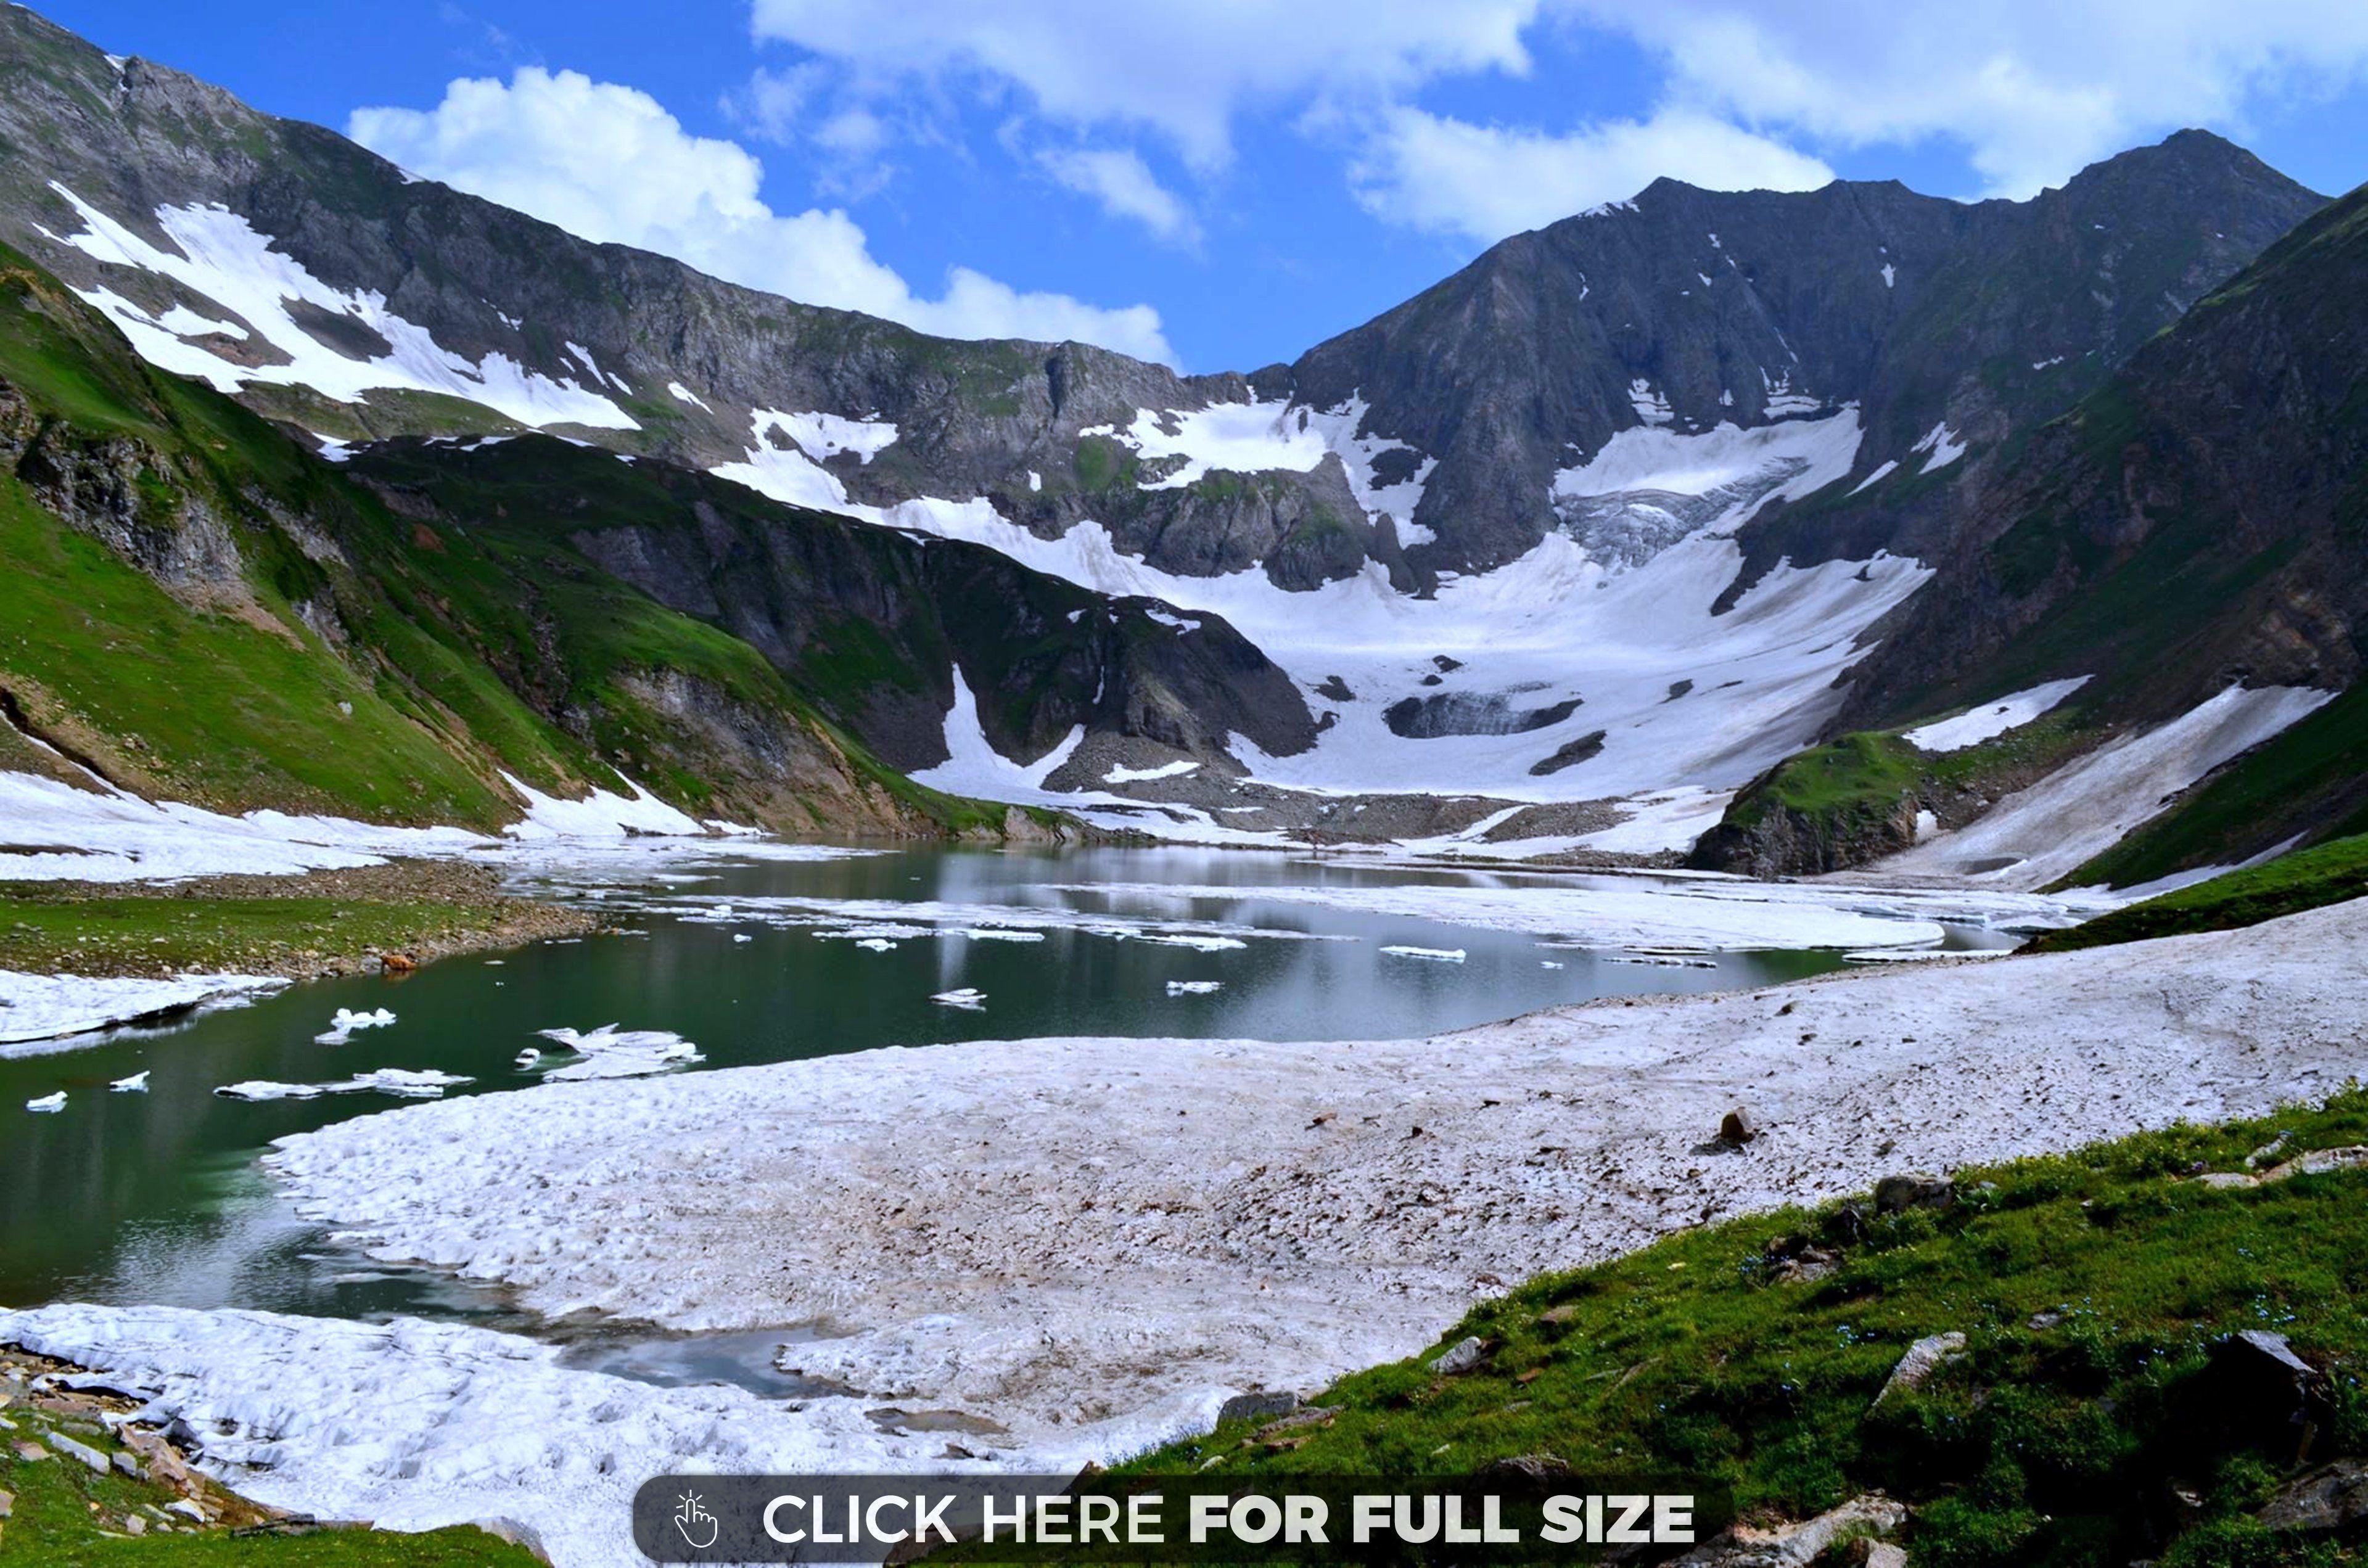 Jammu Kashmir Pangong Lake Wallpapers Hdwallpapers Kashmir Pakistan Pakistan Wallpaper Beautiful Landscape Wallpaper